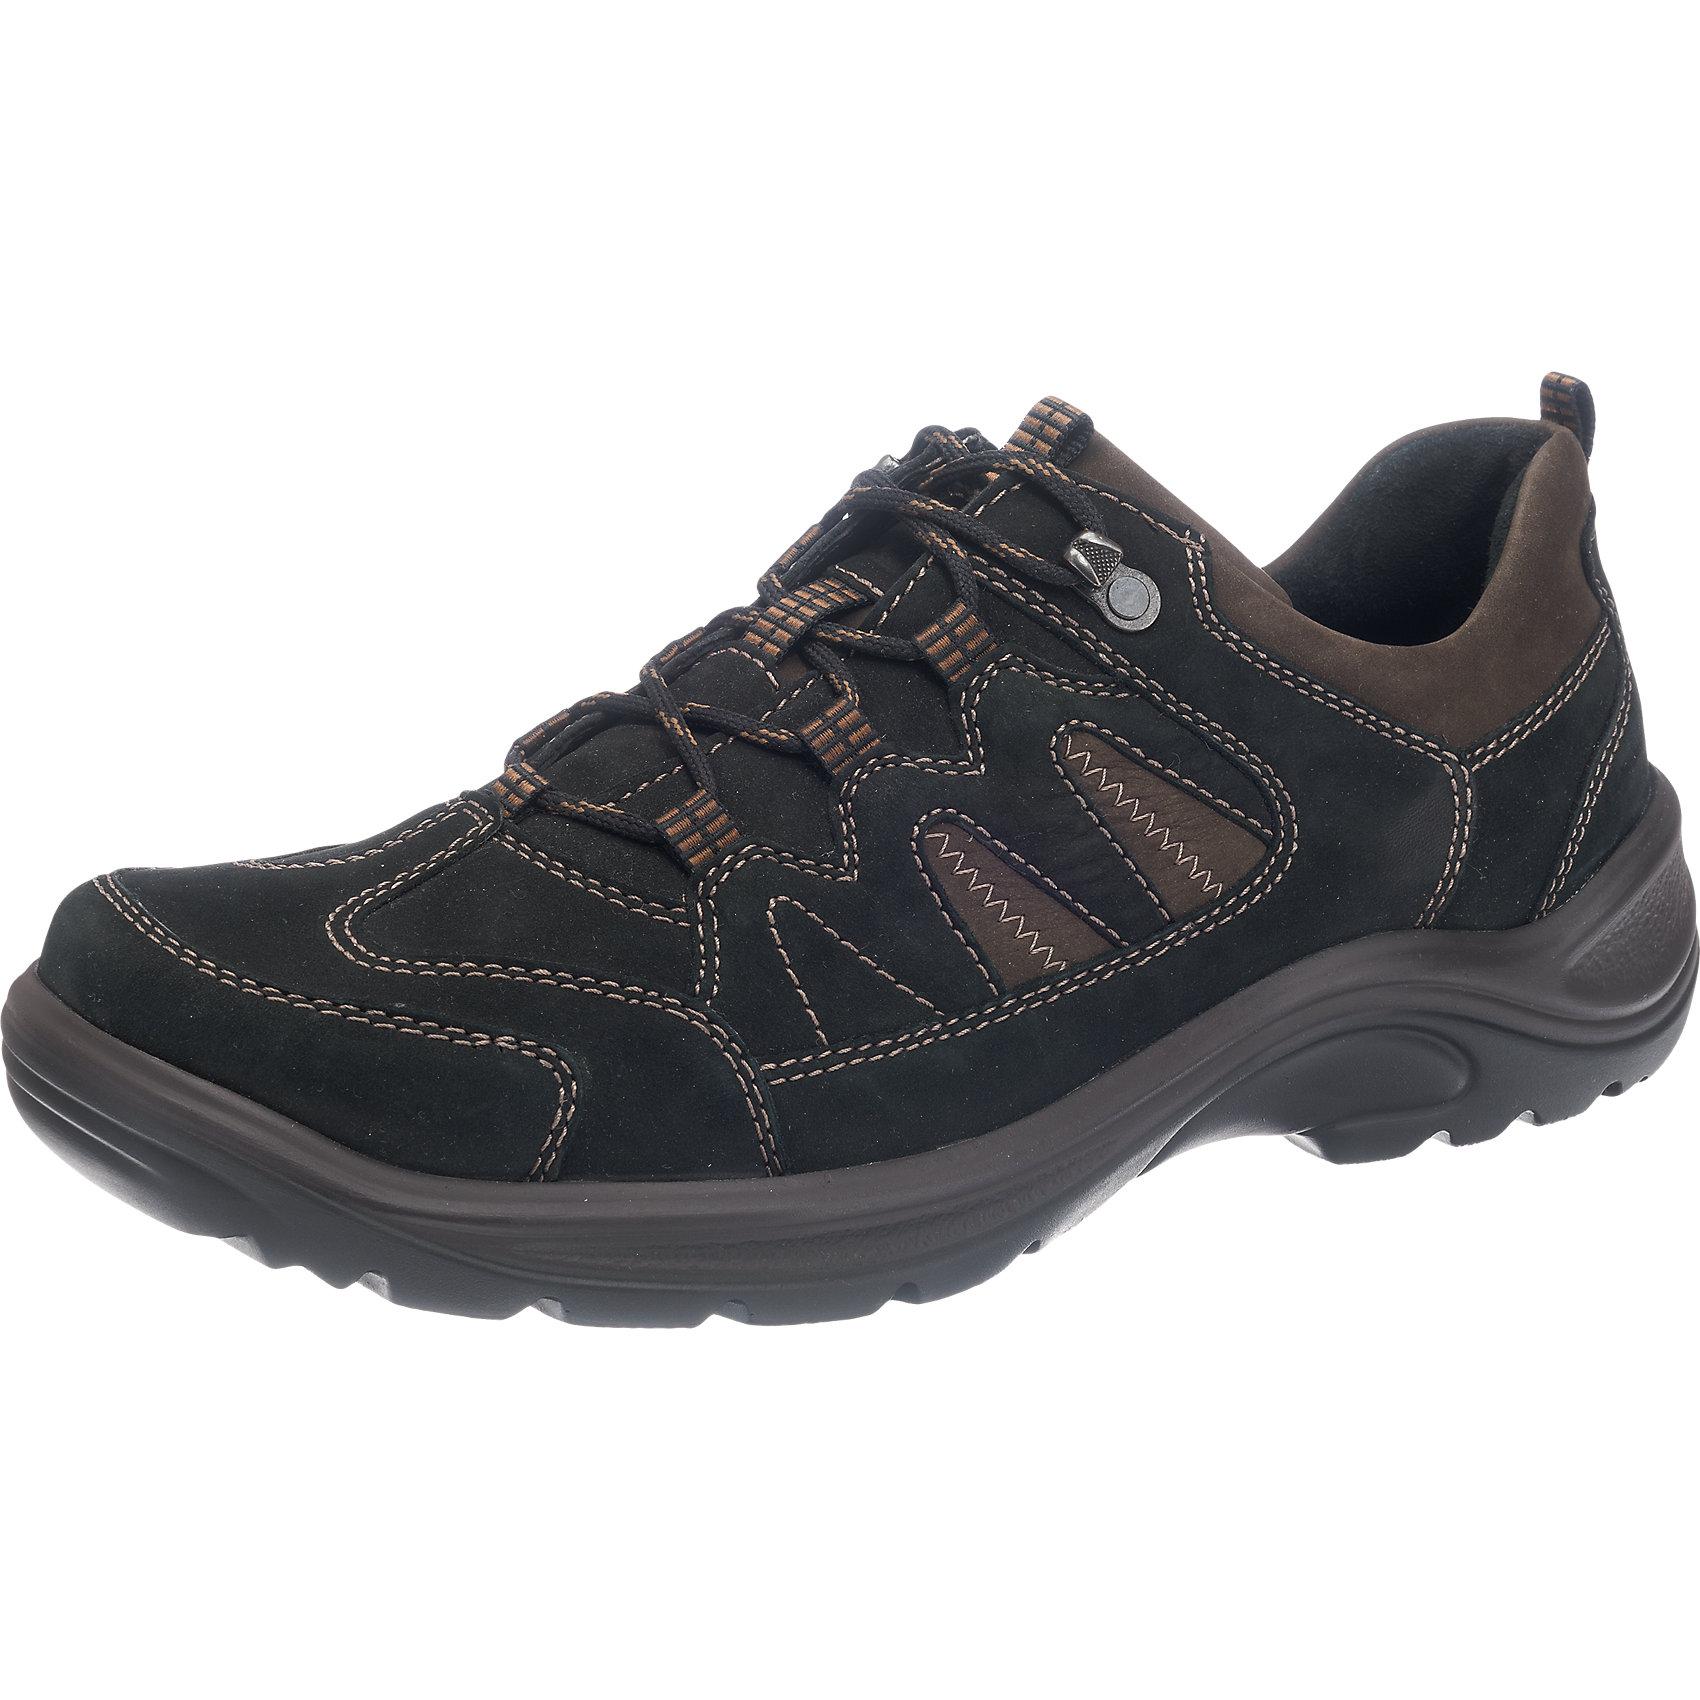 buy popular 2acff 064b9 ... Nike Hyperlive EYBL Basketball Shoe Shoe Shoe Yellow Black 849308-706  Size 11 4de51c ...